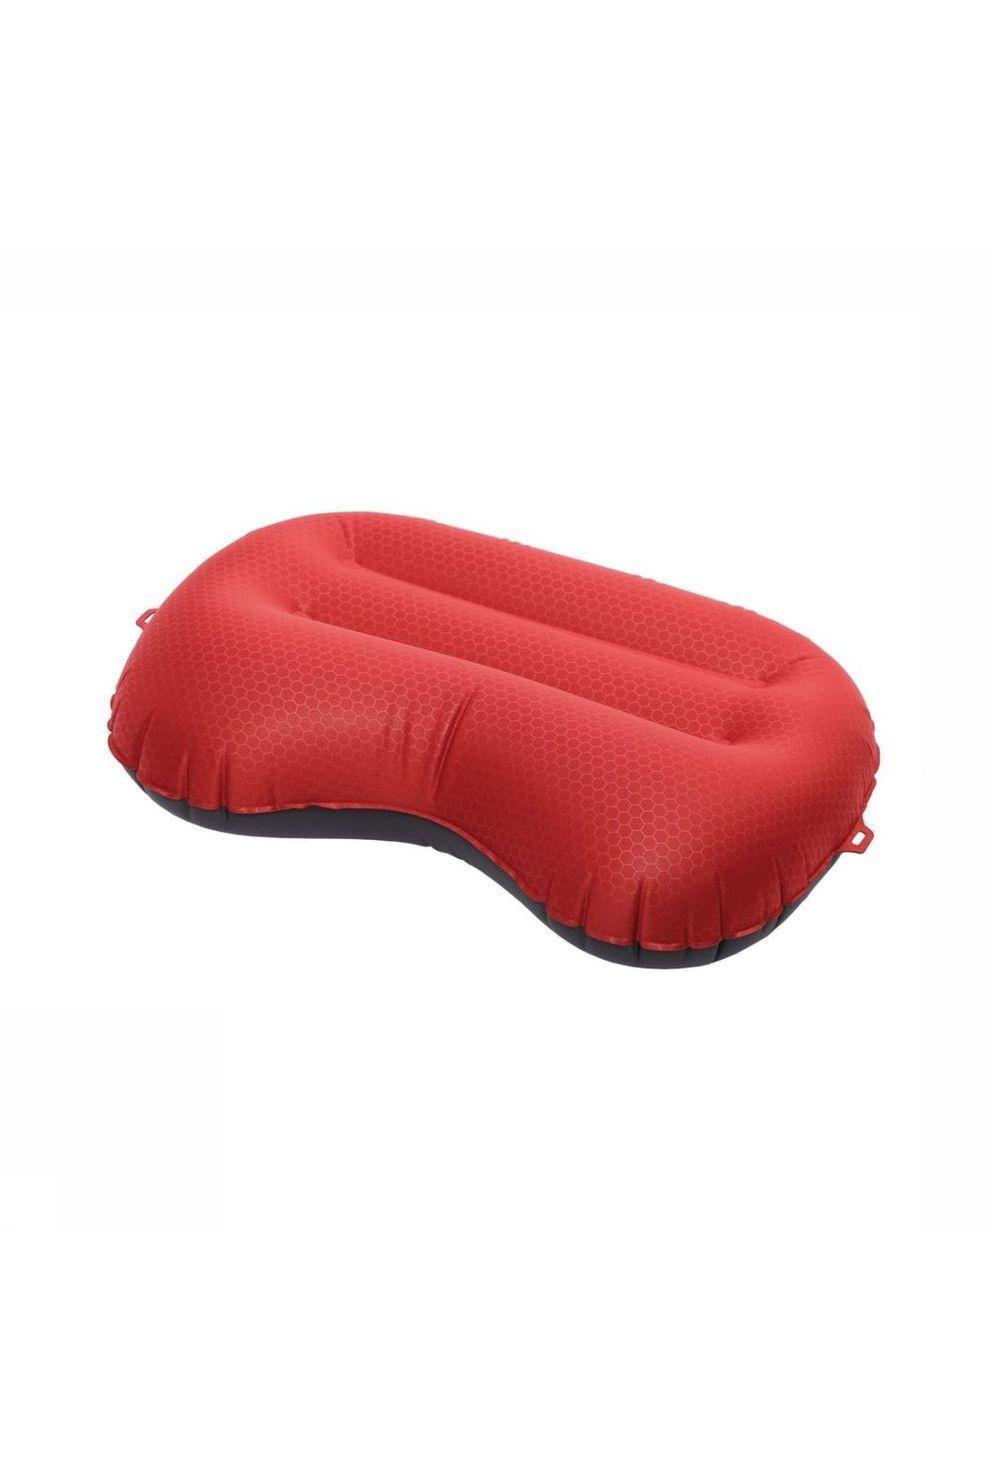 Exped Air Pillow XL Kussen - Rood